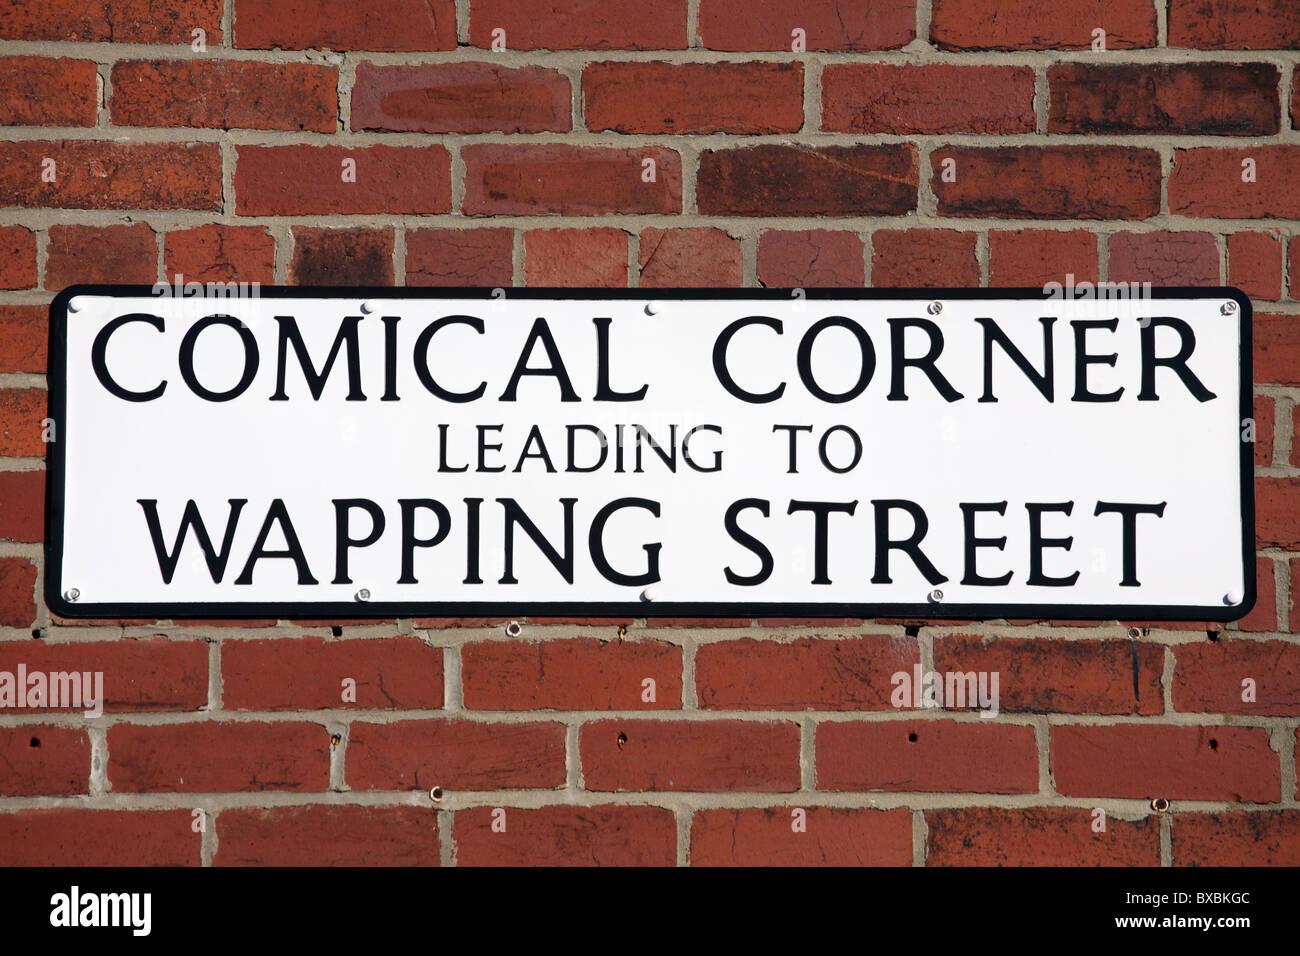 Plaque de rue amusante angle comique menant à Wapping Street, South Shields, Tyne and Wear, England, UK Banque D'Images